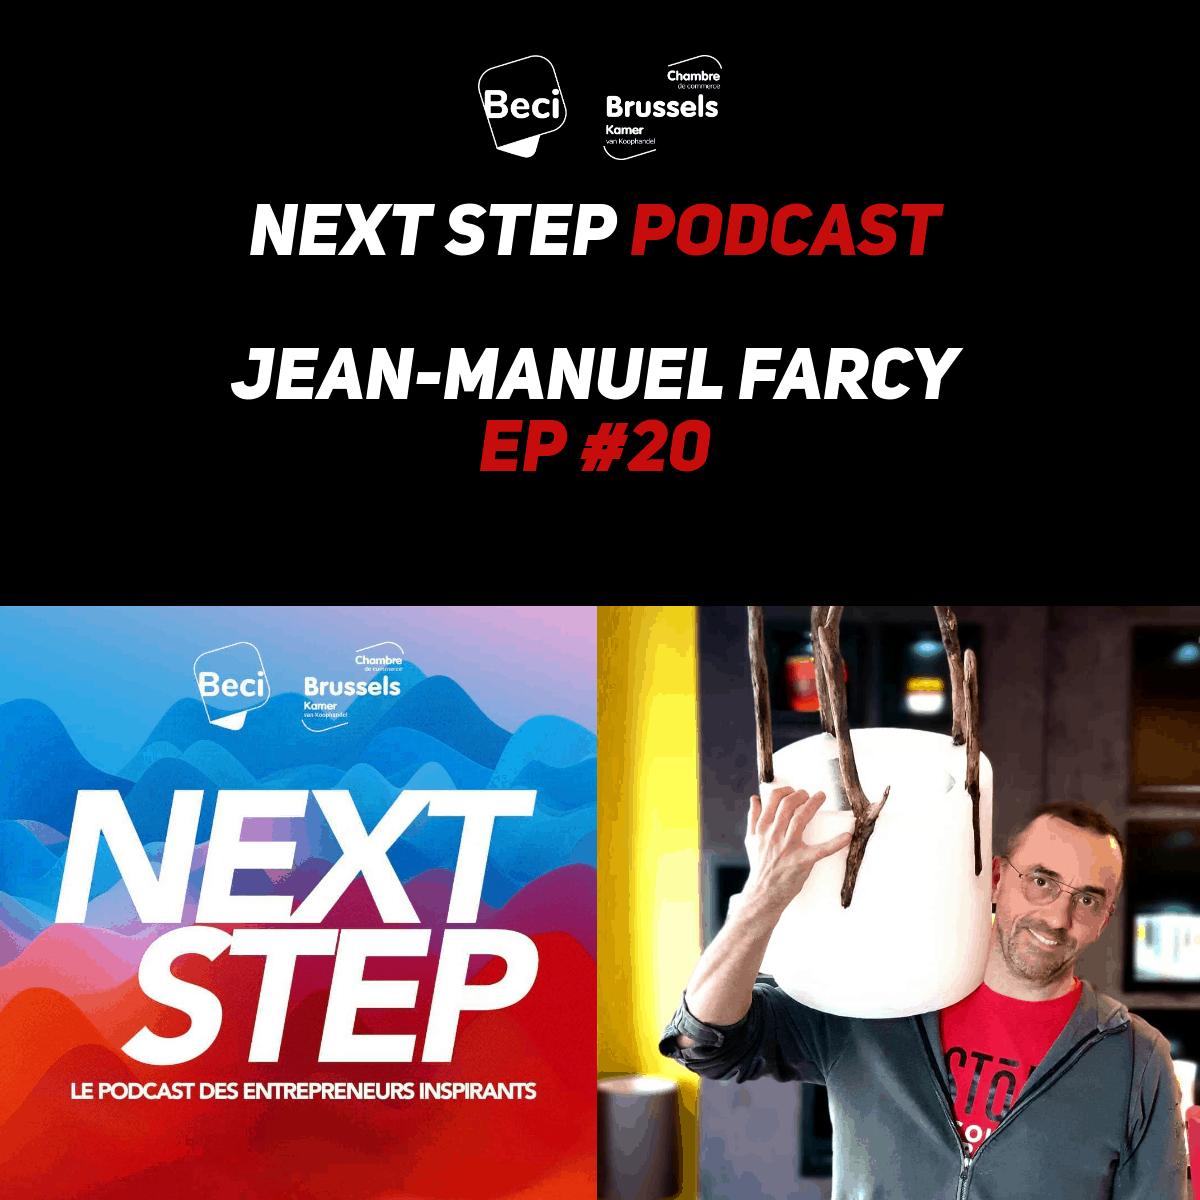 Jean Manuel Farcy